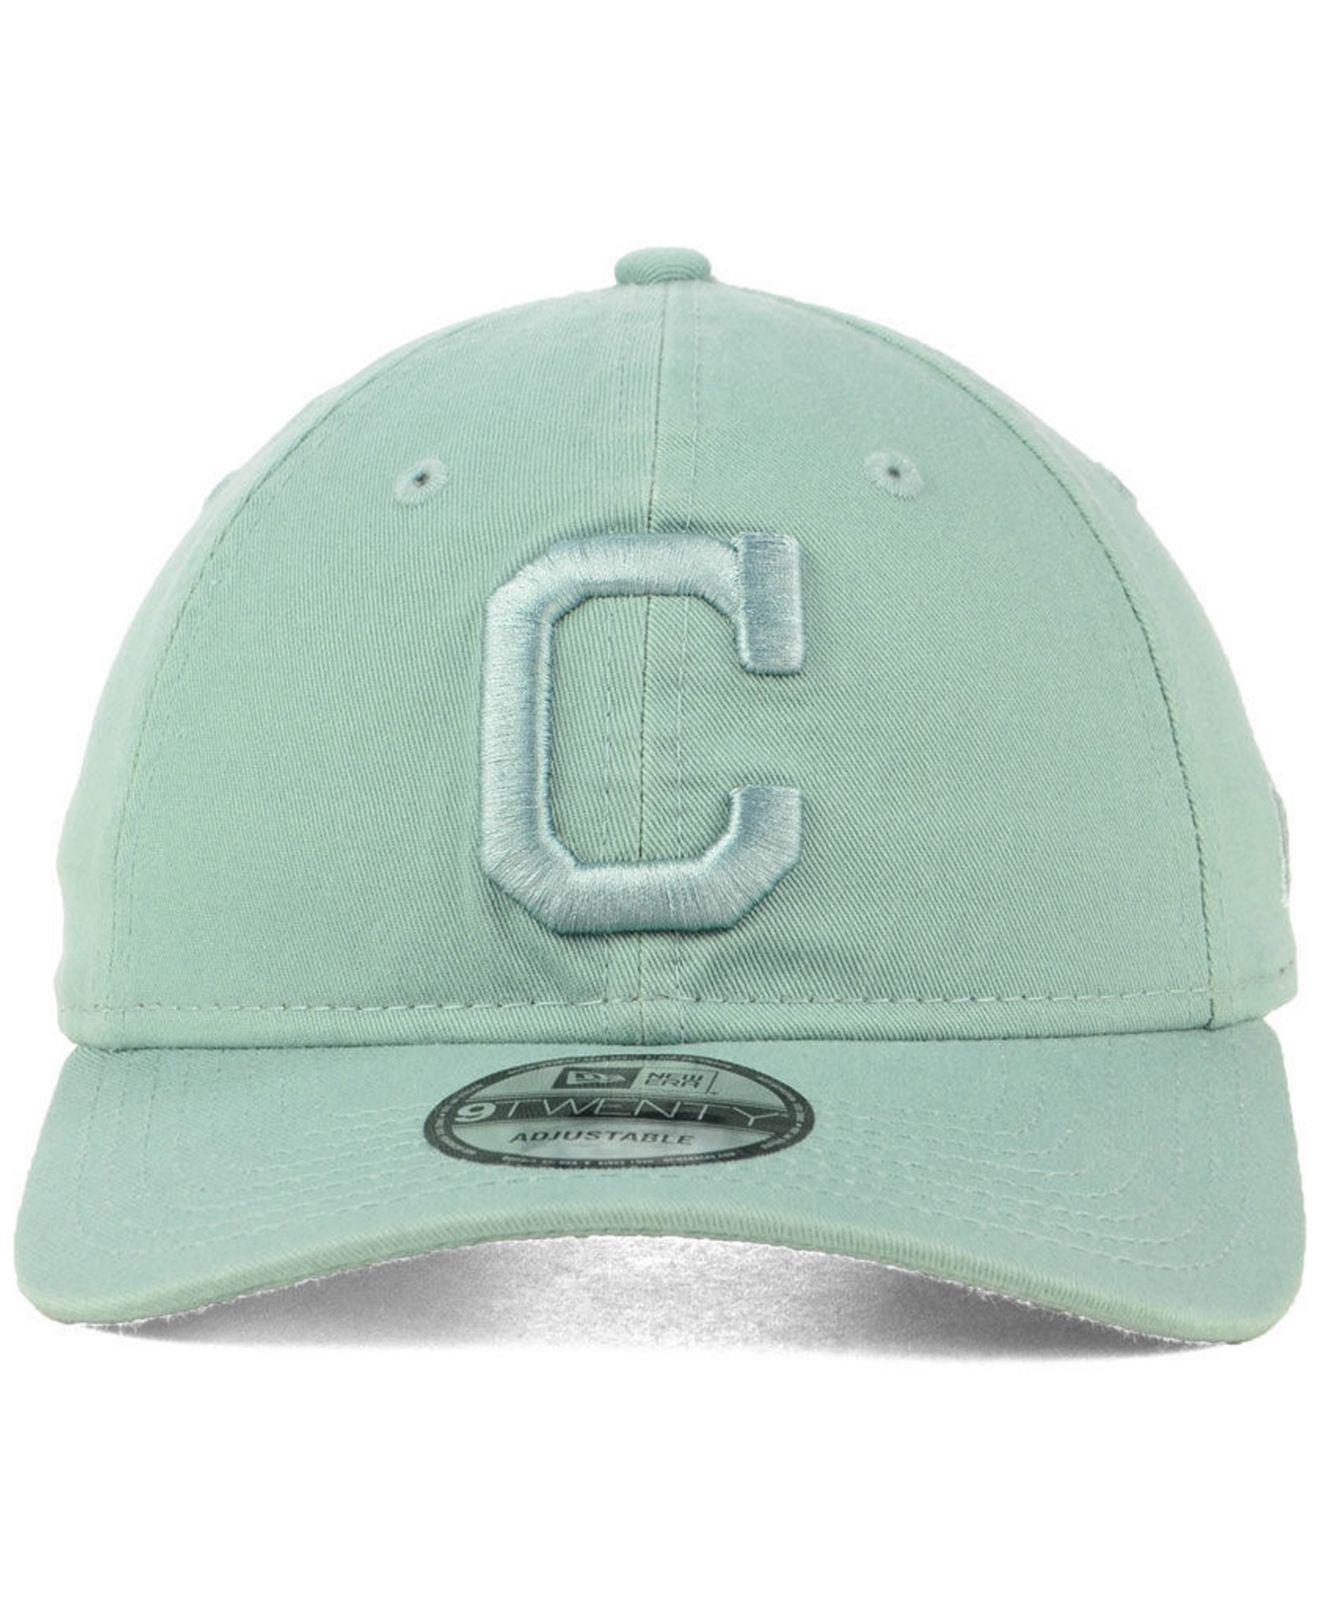 wholesale dealer 1f5d7 70c5a ... coupon code for lyst ktz cleveland indians spring classic 9twenty cap  in blue for men 786d3